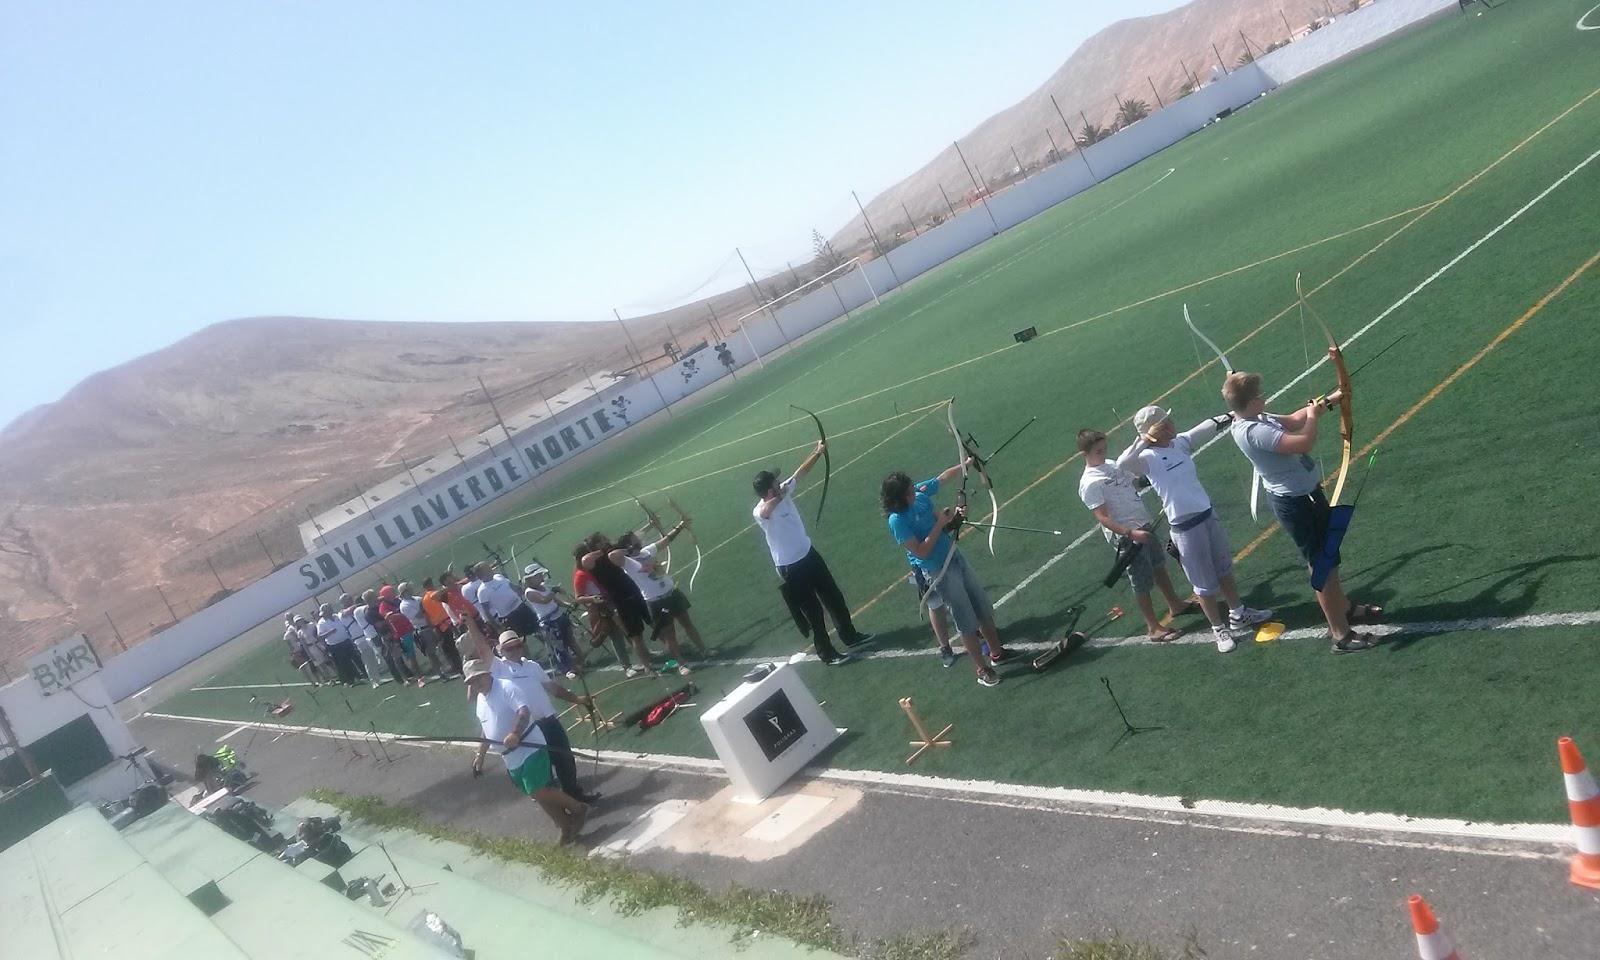 Club Malpaisomys Tiro con Arco: Trofeo regional de verano Malpaisomys